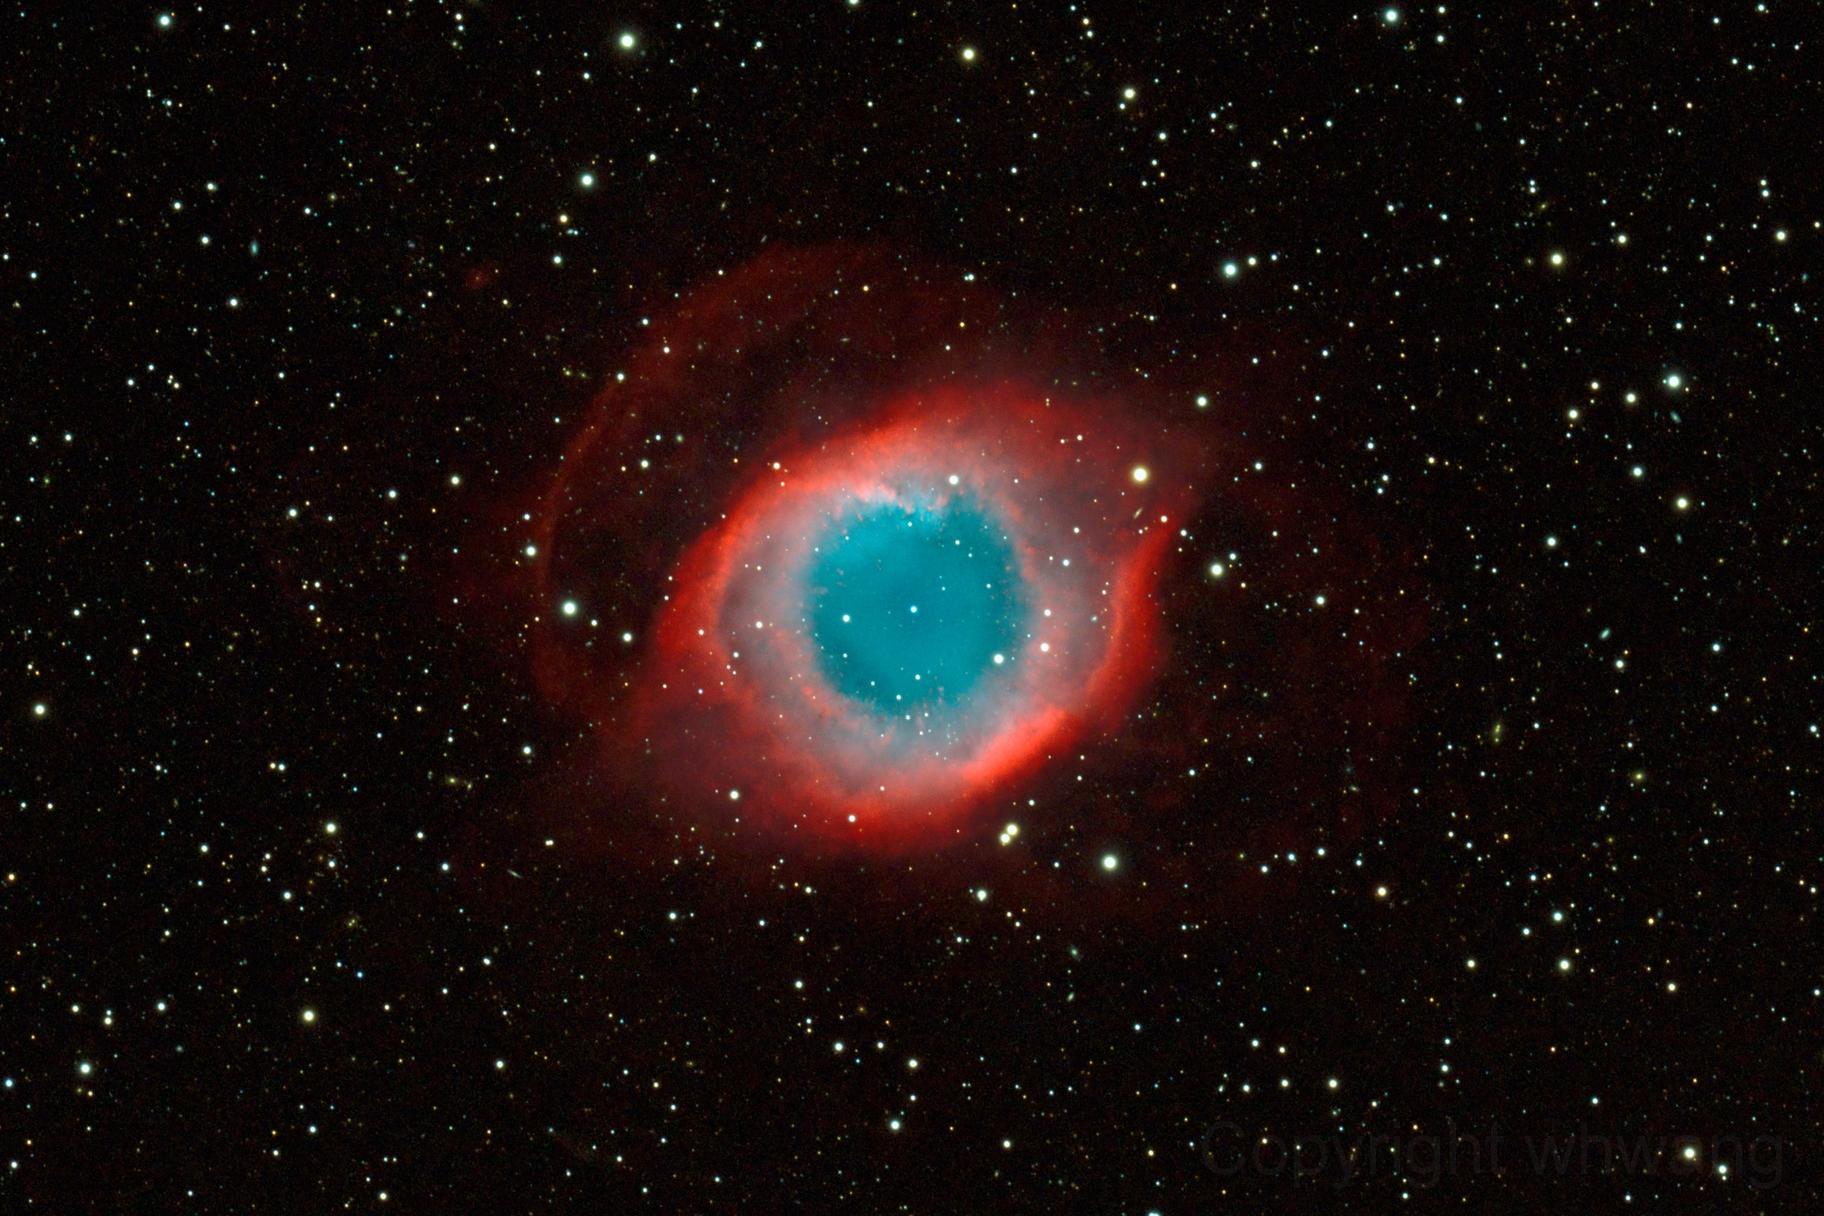 Free Download Pin Helix Nebula Eye Of God Hd Desktop Wallpaper